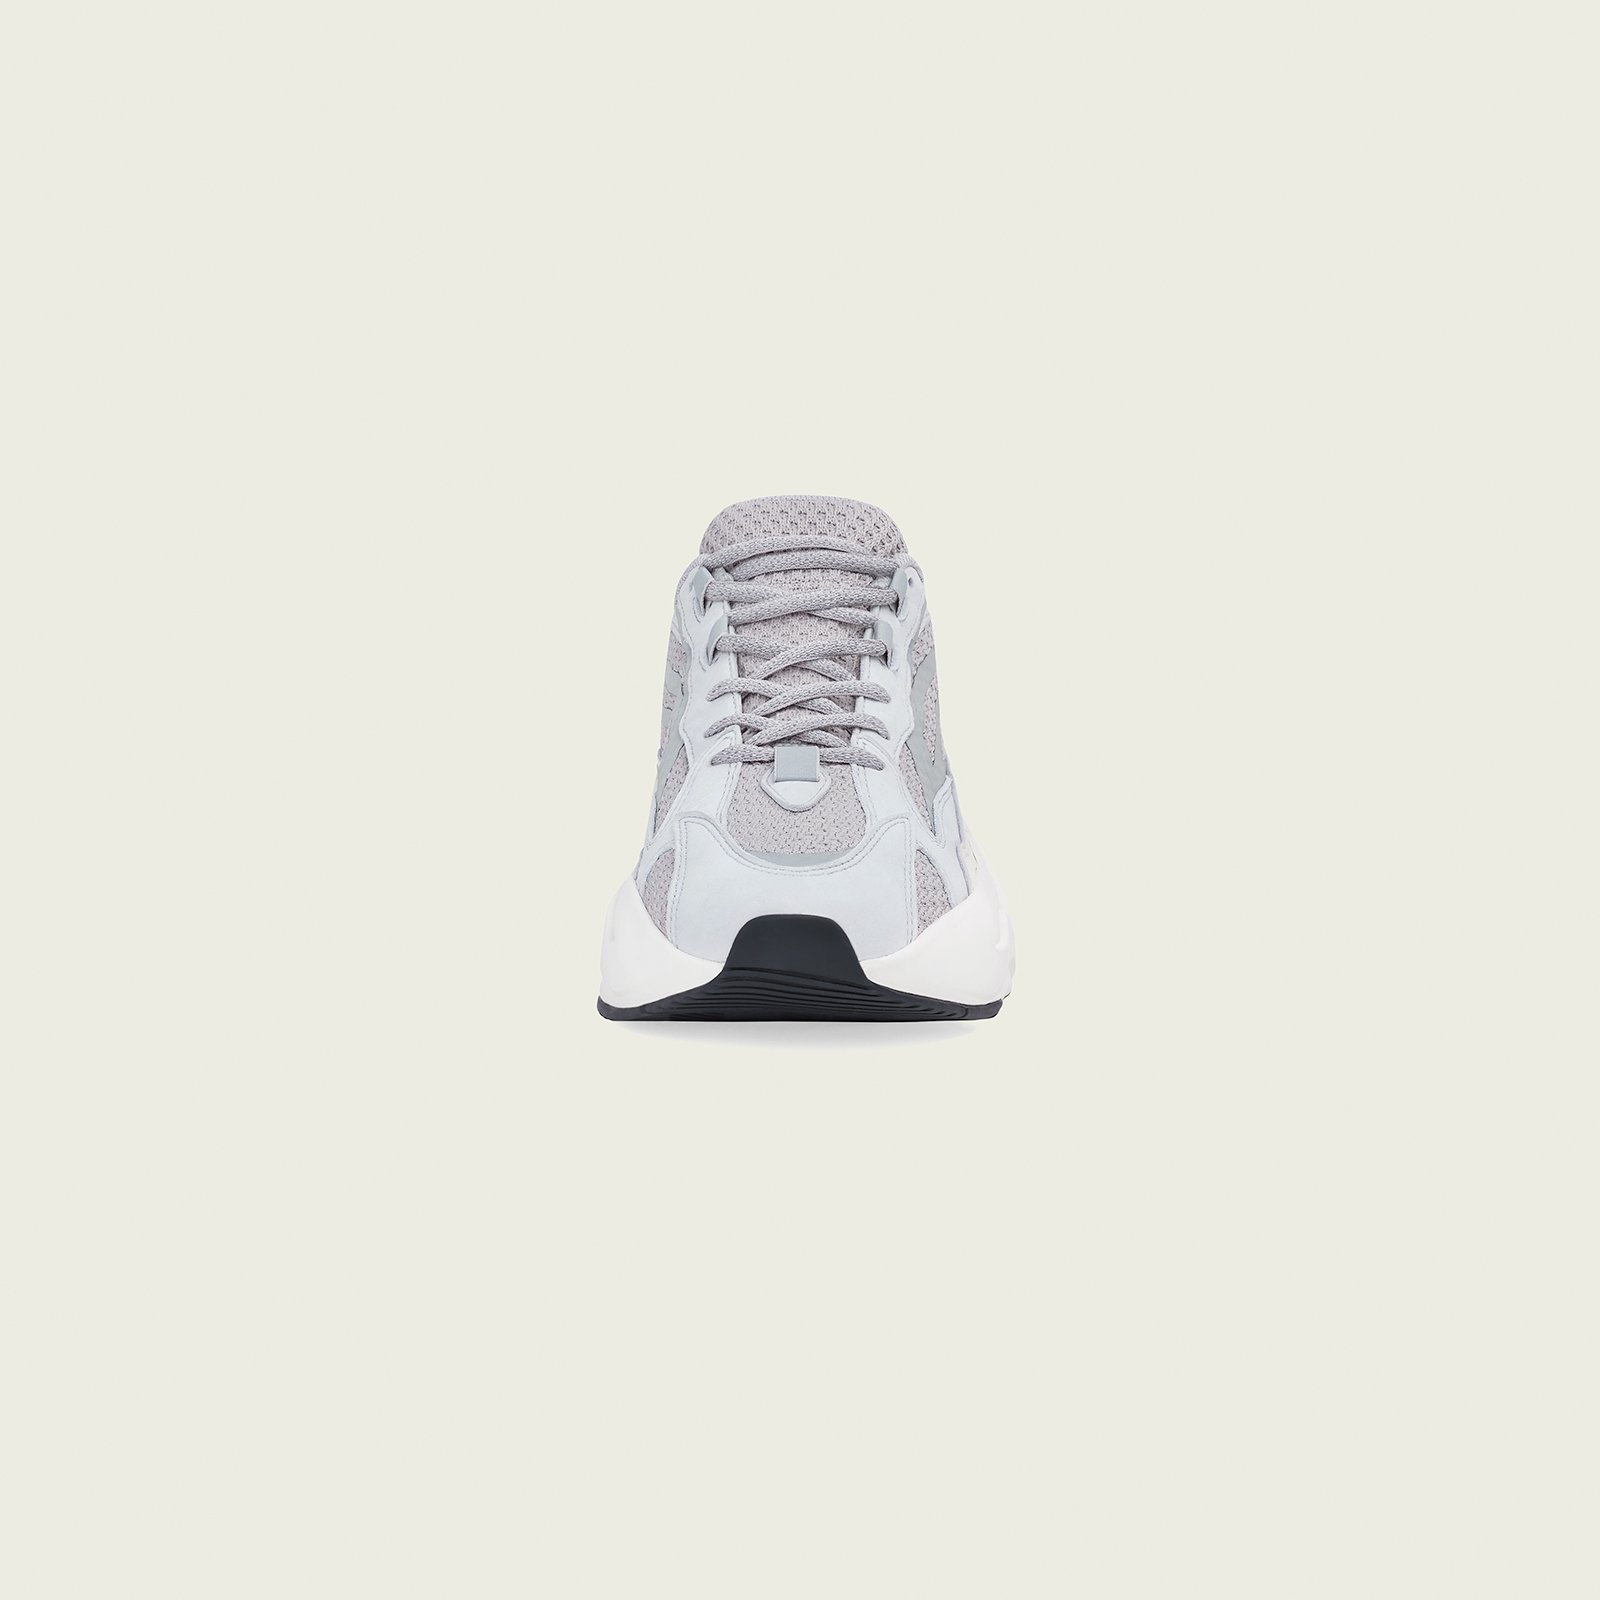 4bd578548da8 ... adidas Originals x Kanye West Yeezy Boost 700 V2 ...